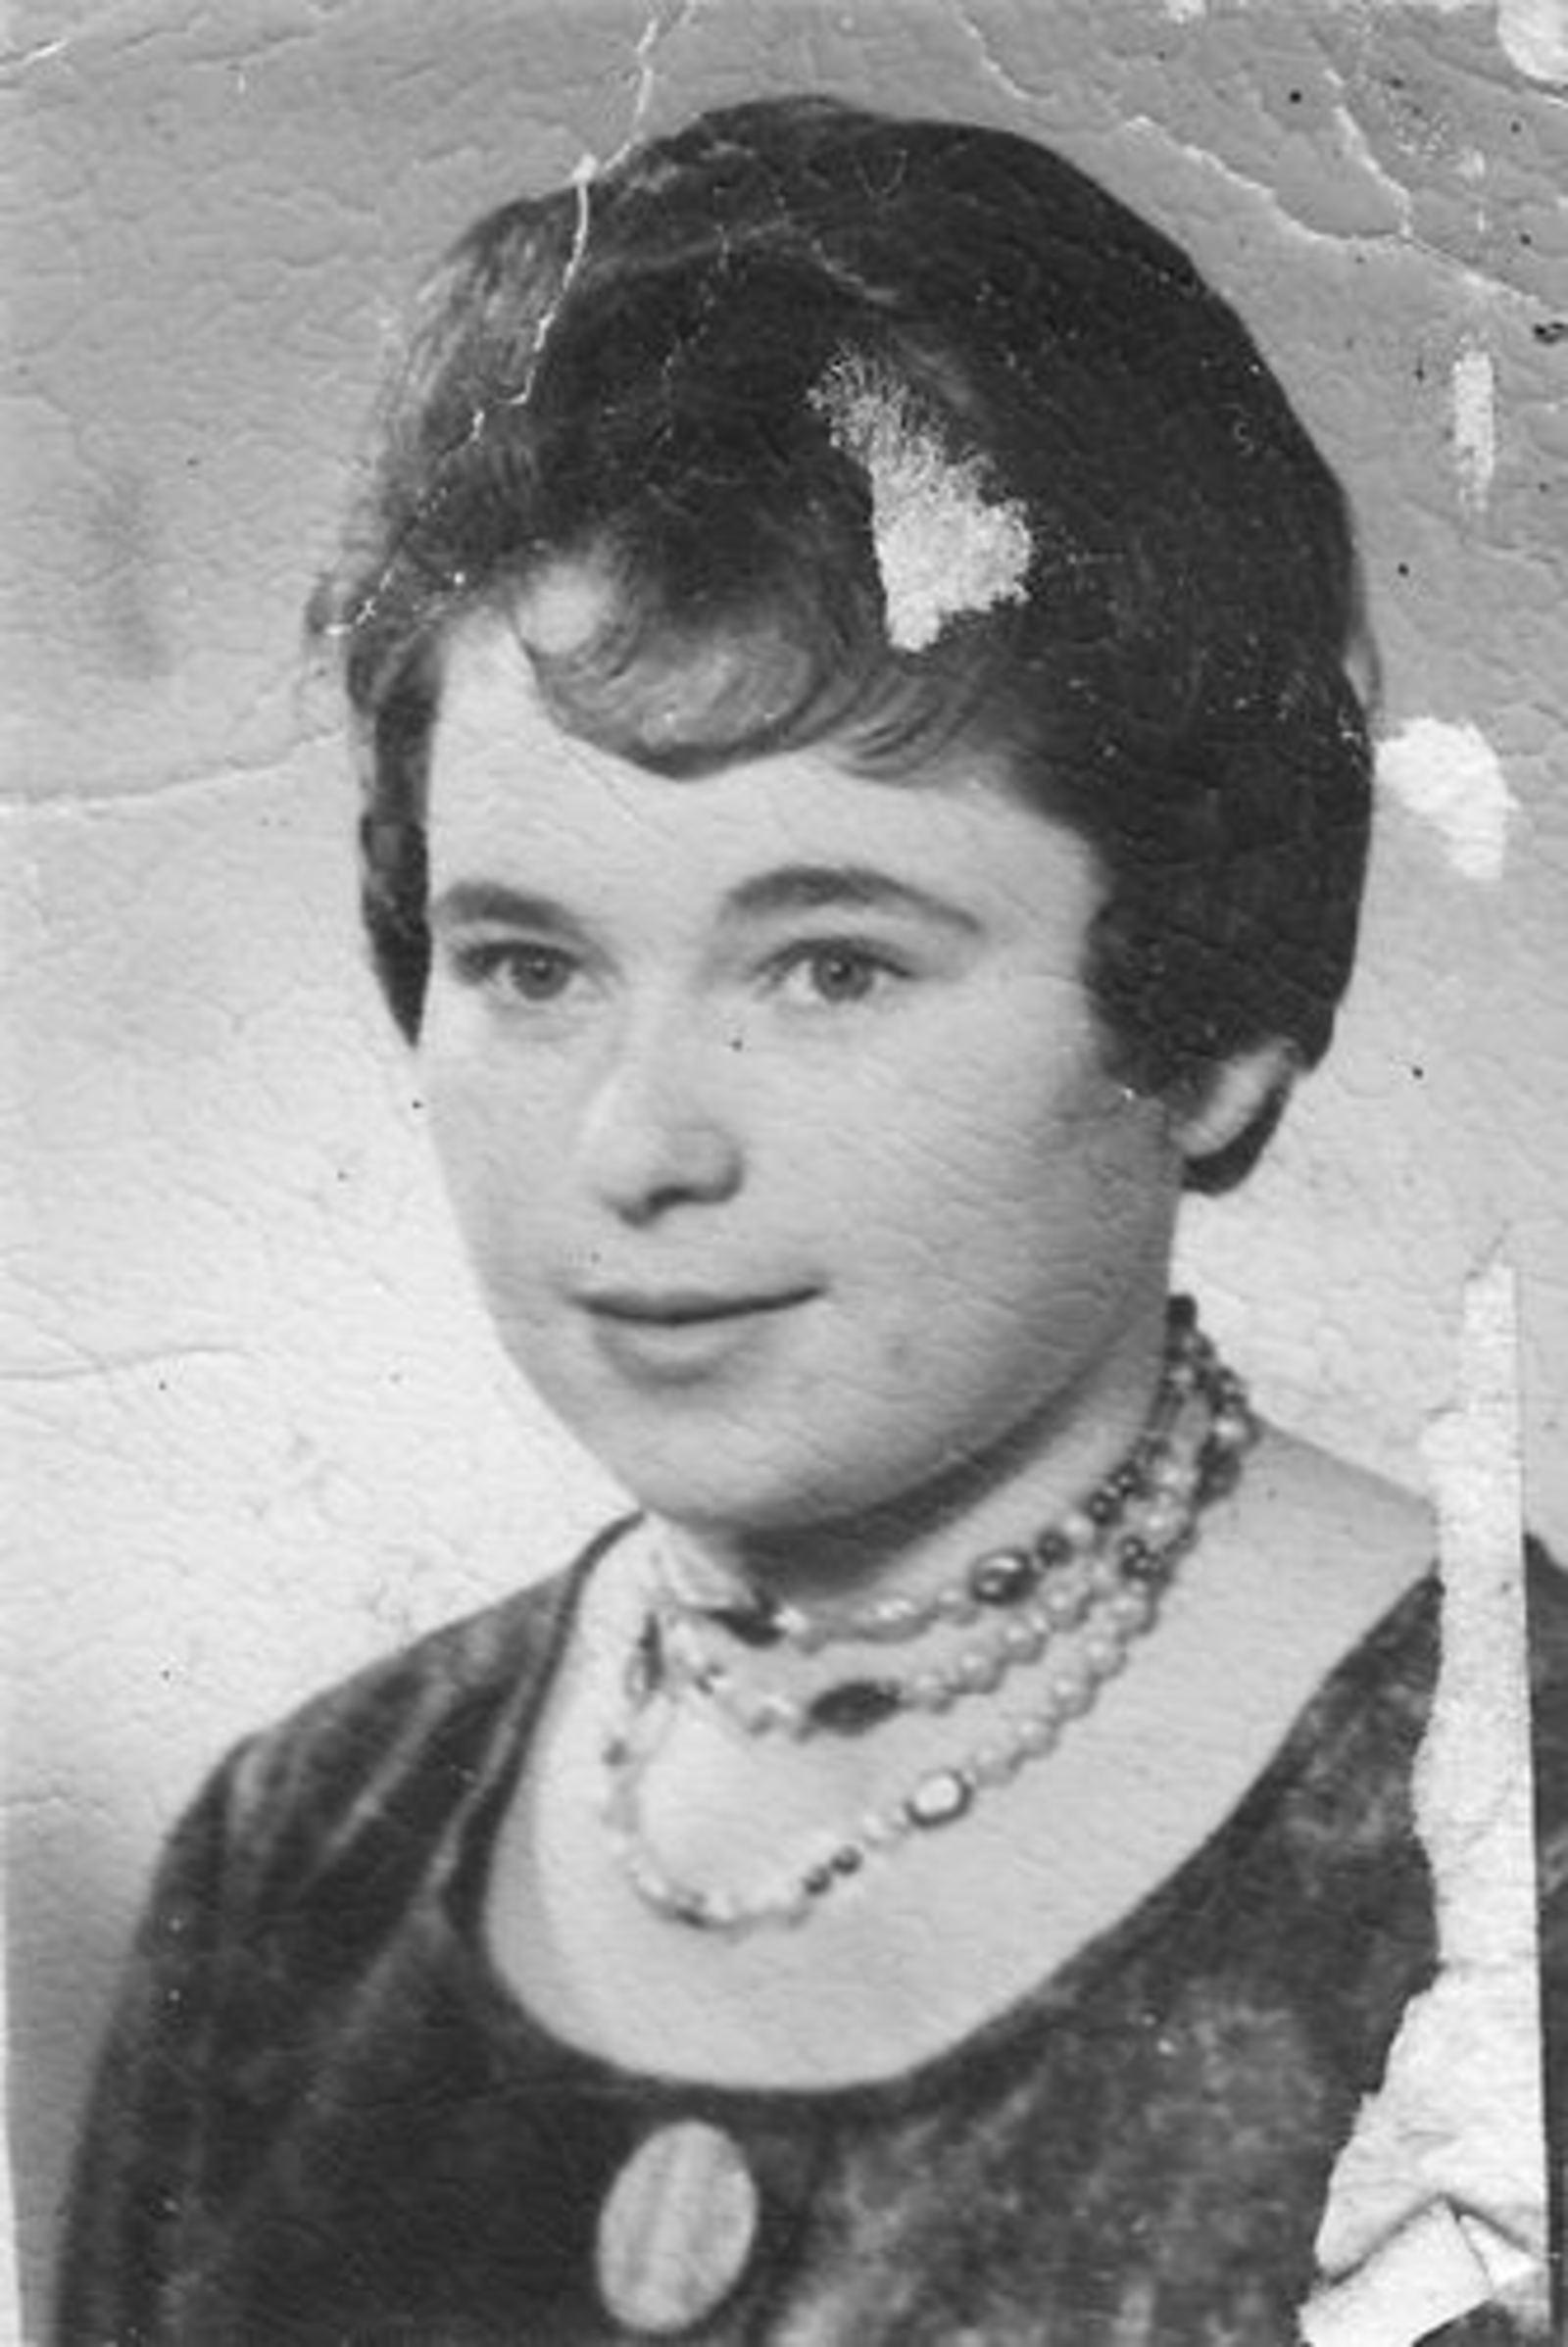 Koolbergen Ellie 1943 1955± Portret